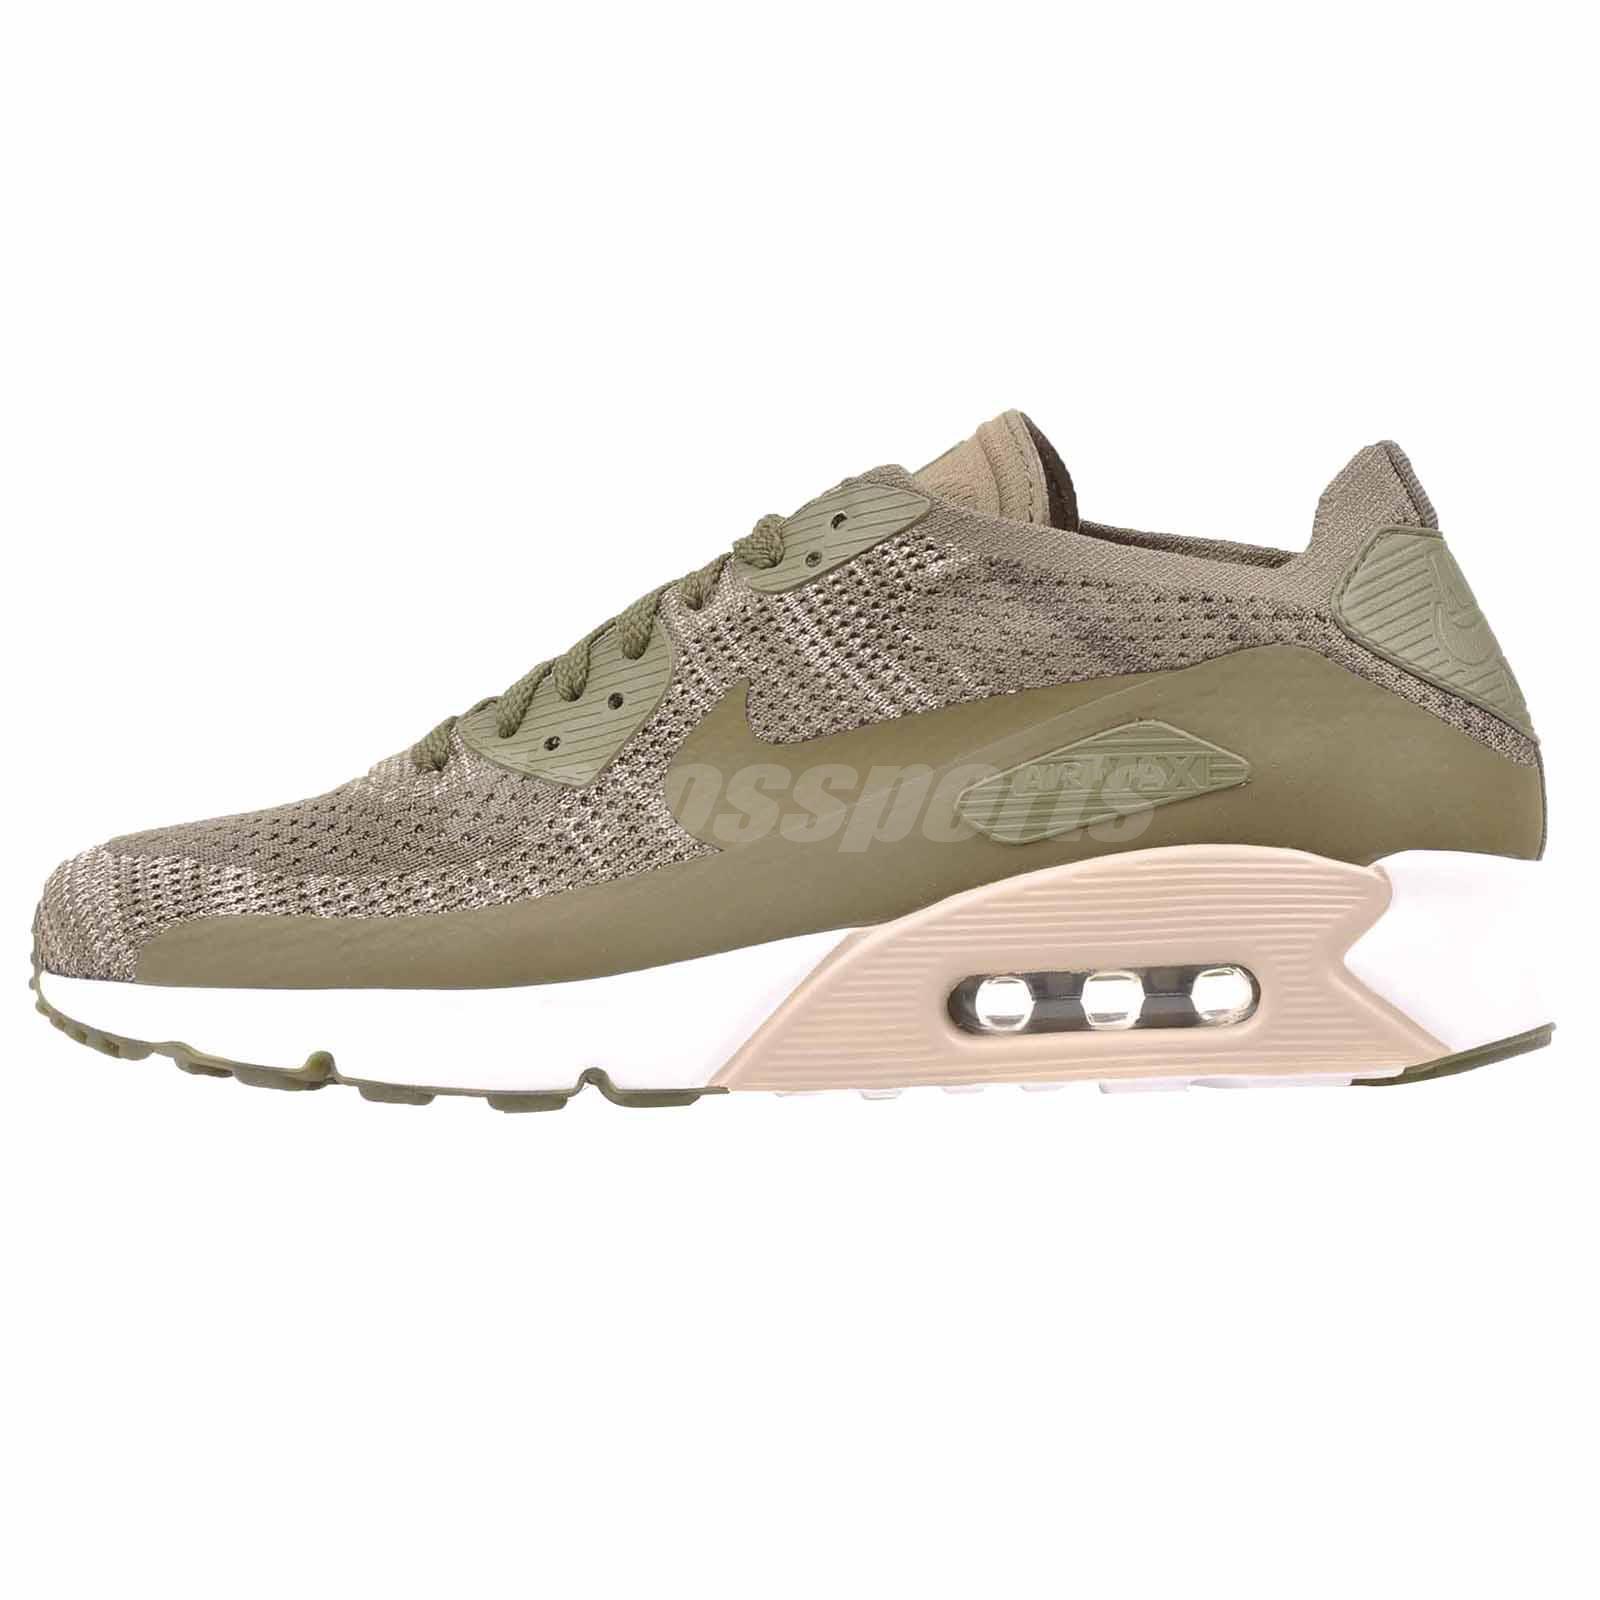 Nike Air Max 90 Ultra 2.0 Flyknit Running Uomo Shoes Medium Olive 875943-200